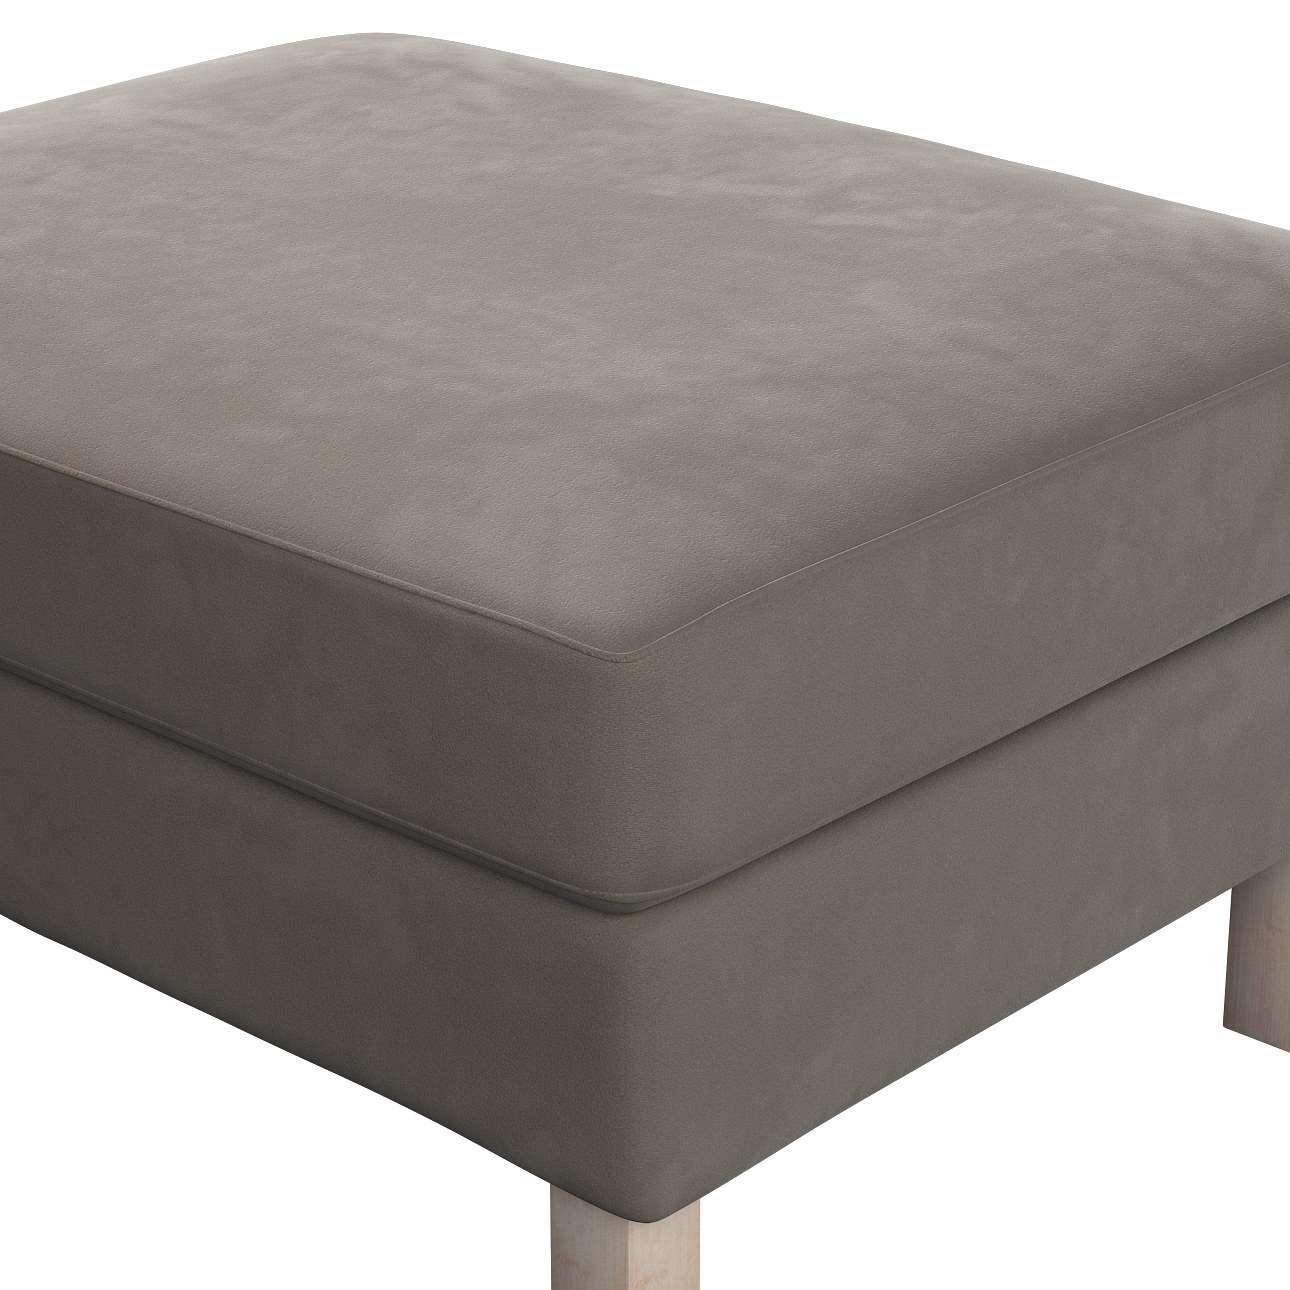 karlstad armchair cover uk smart chair electric wheelchair footstool grey beige dekoria